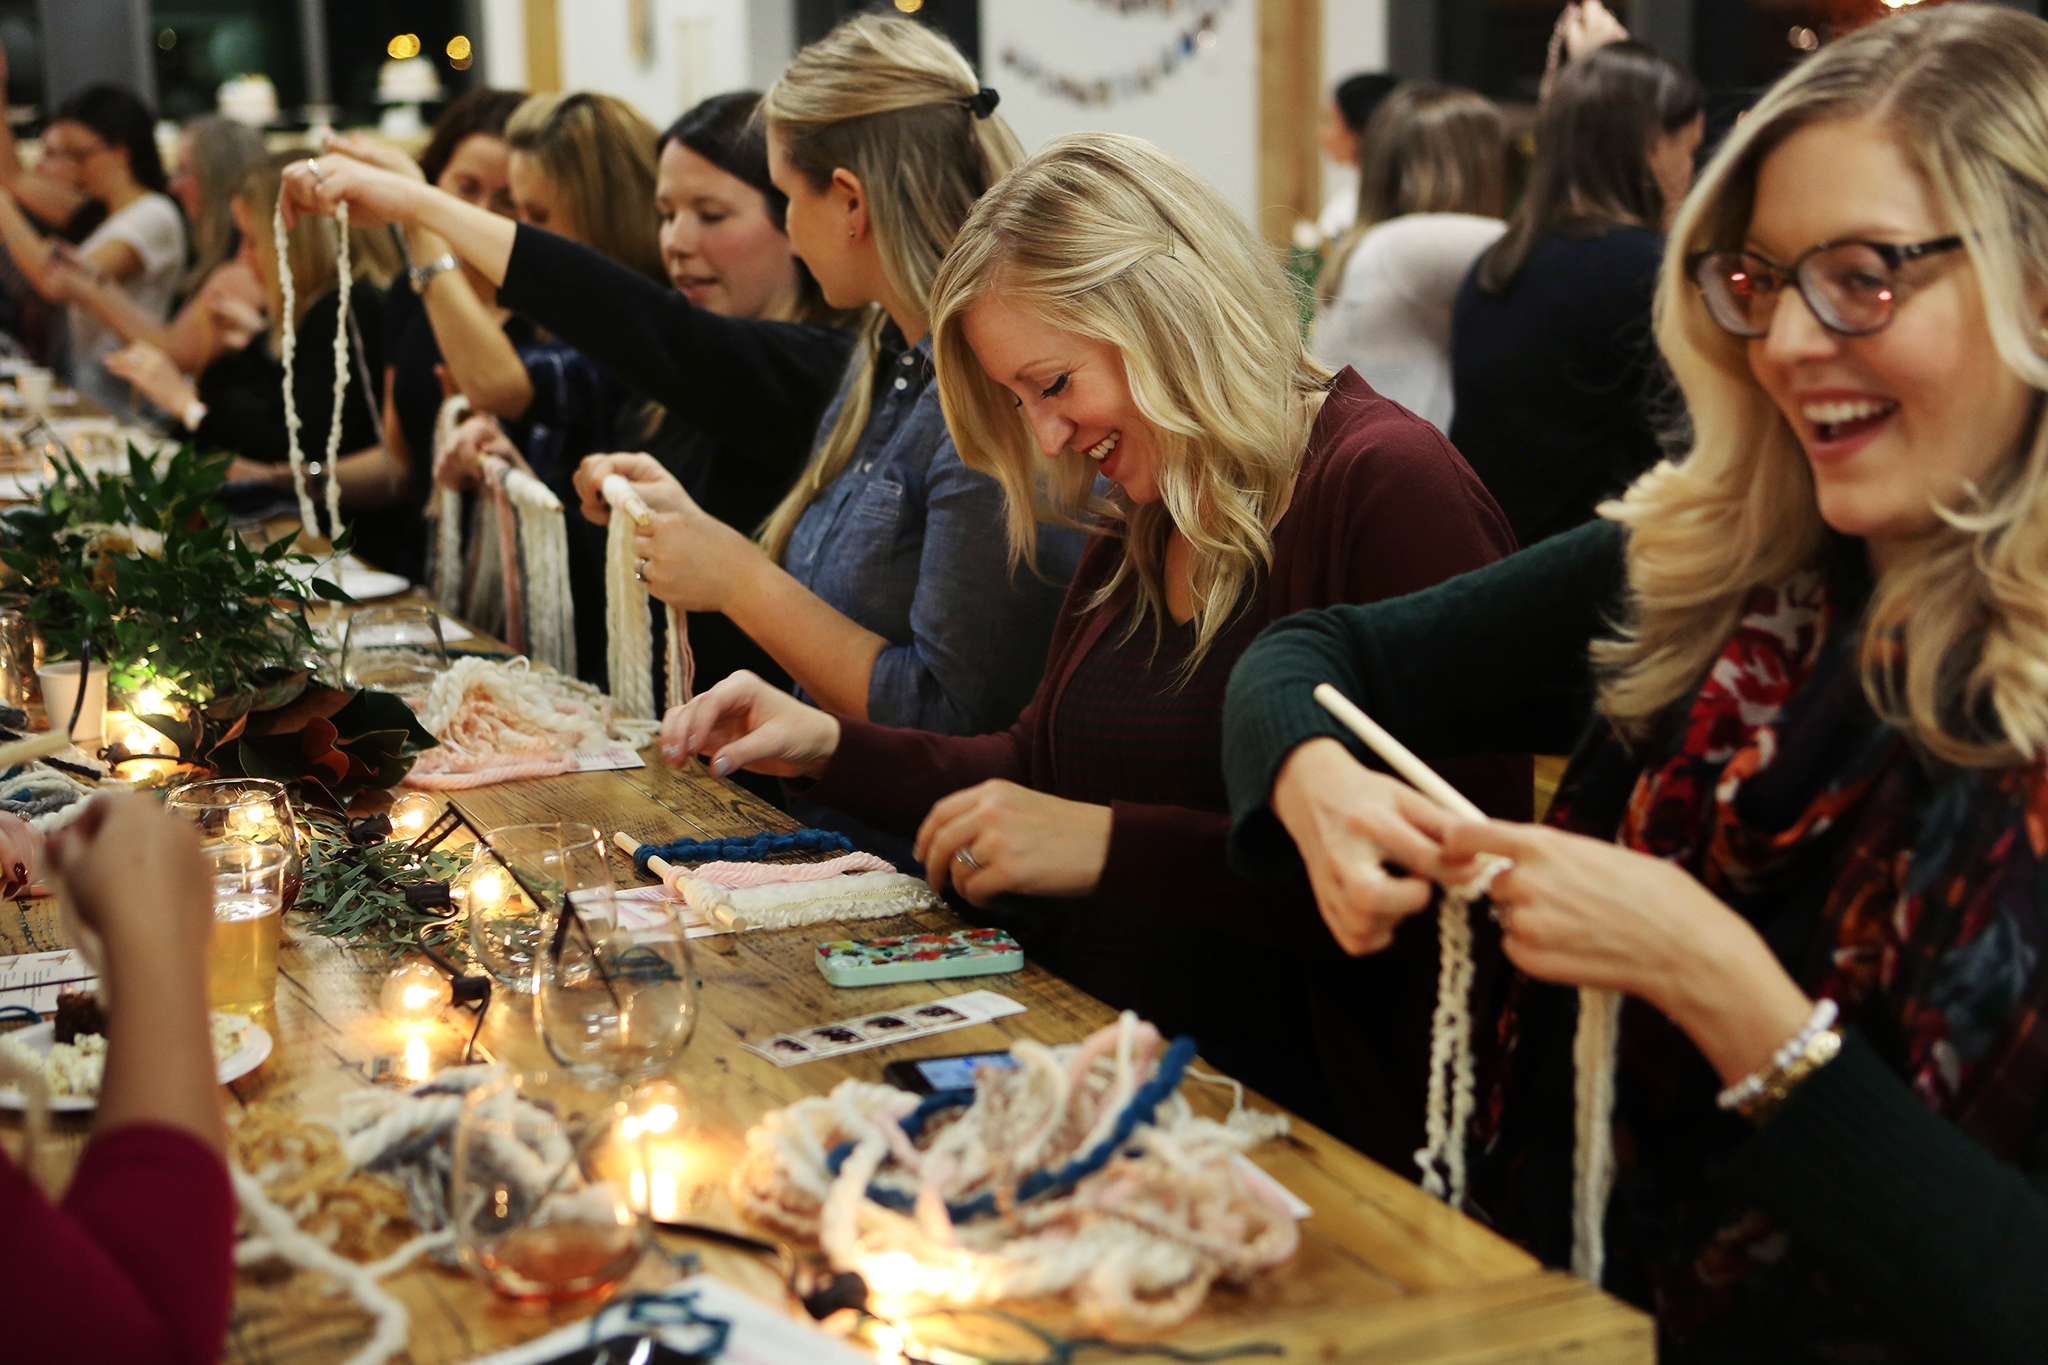 Made Social event - photo by Andrea Hanki